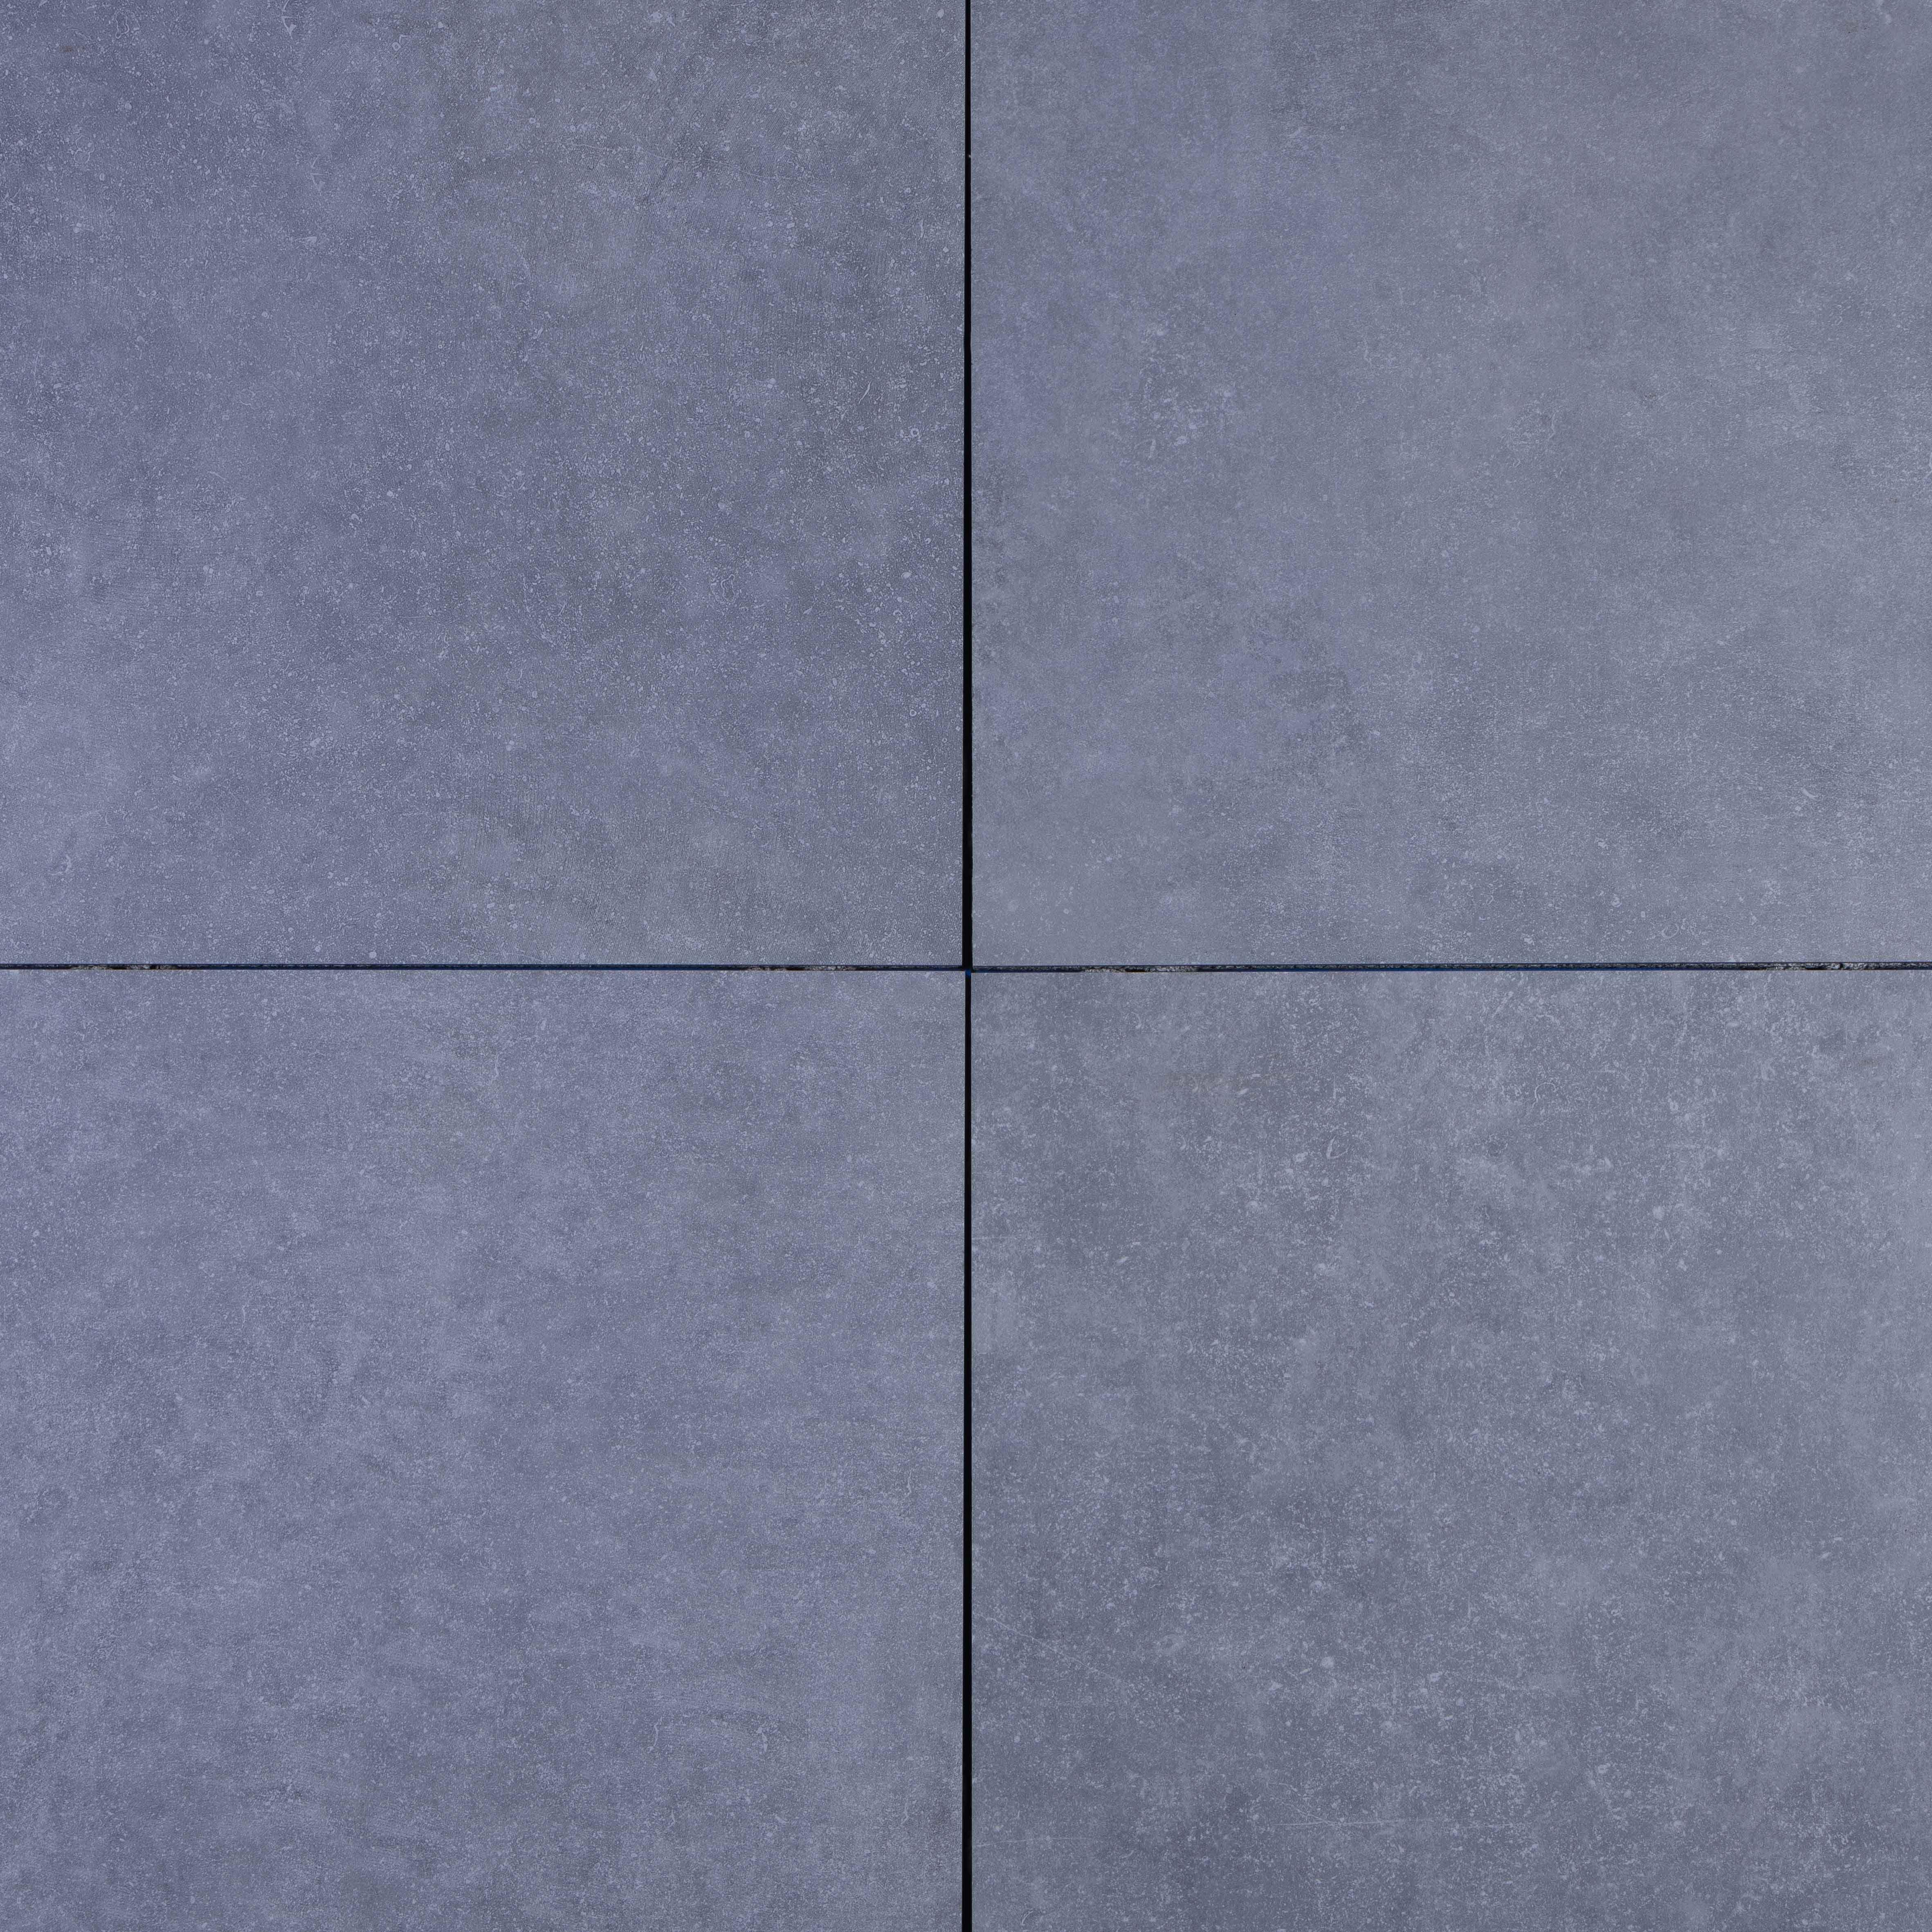 Keramische Tegels 80x80 Prijzen.Keramische Terrastegel Geoceramica Impasto Grigio 80 X 80 X 4 Cm